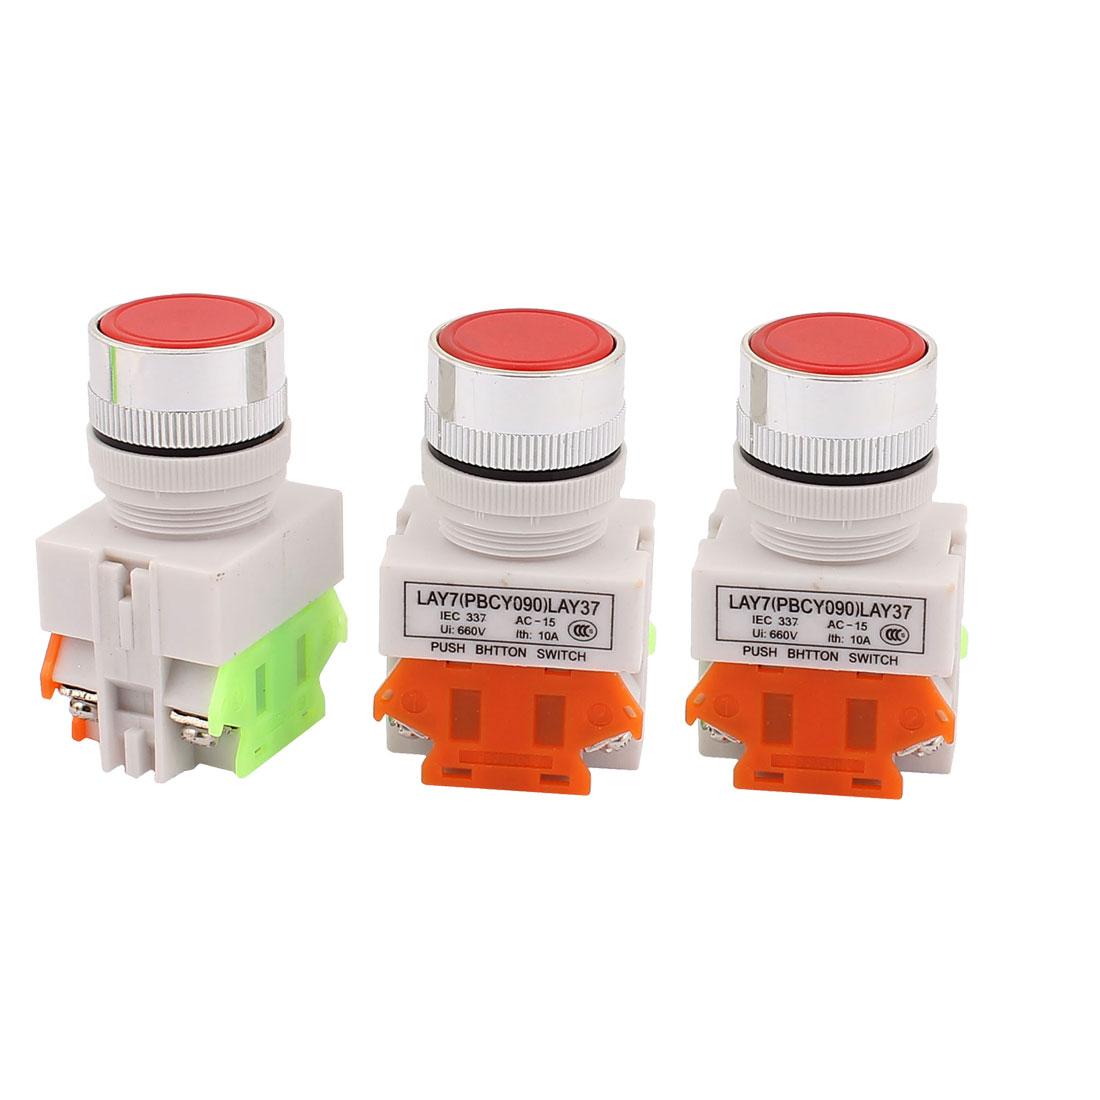 3PCS AC 660V 10A 1NO 1NC DPST 4Pin Self-Locking Red Push Button Switch